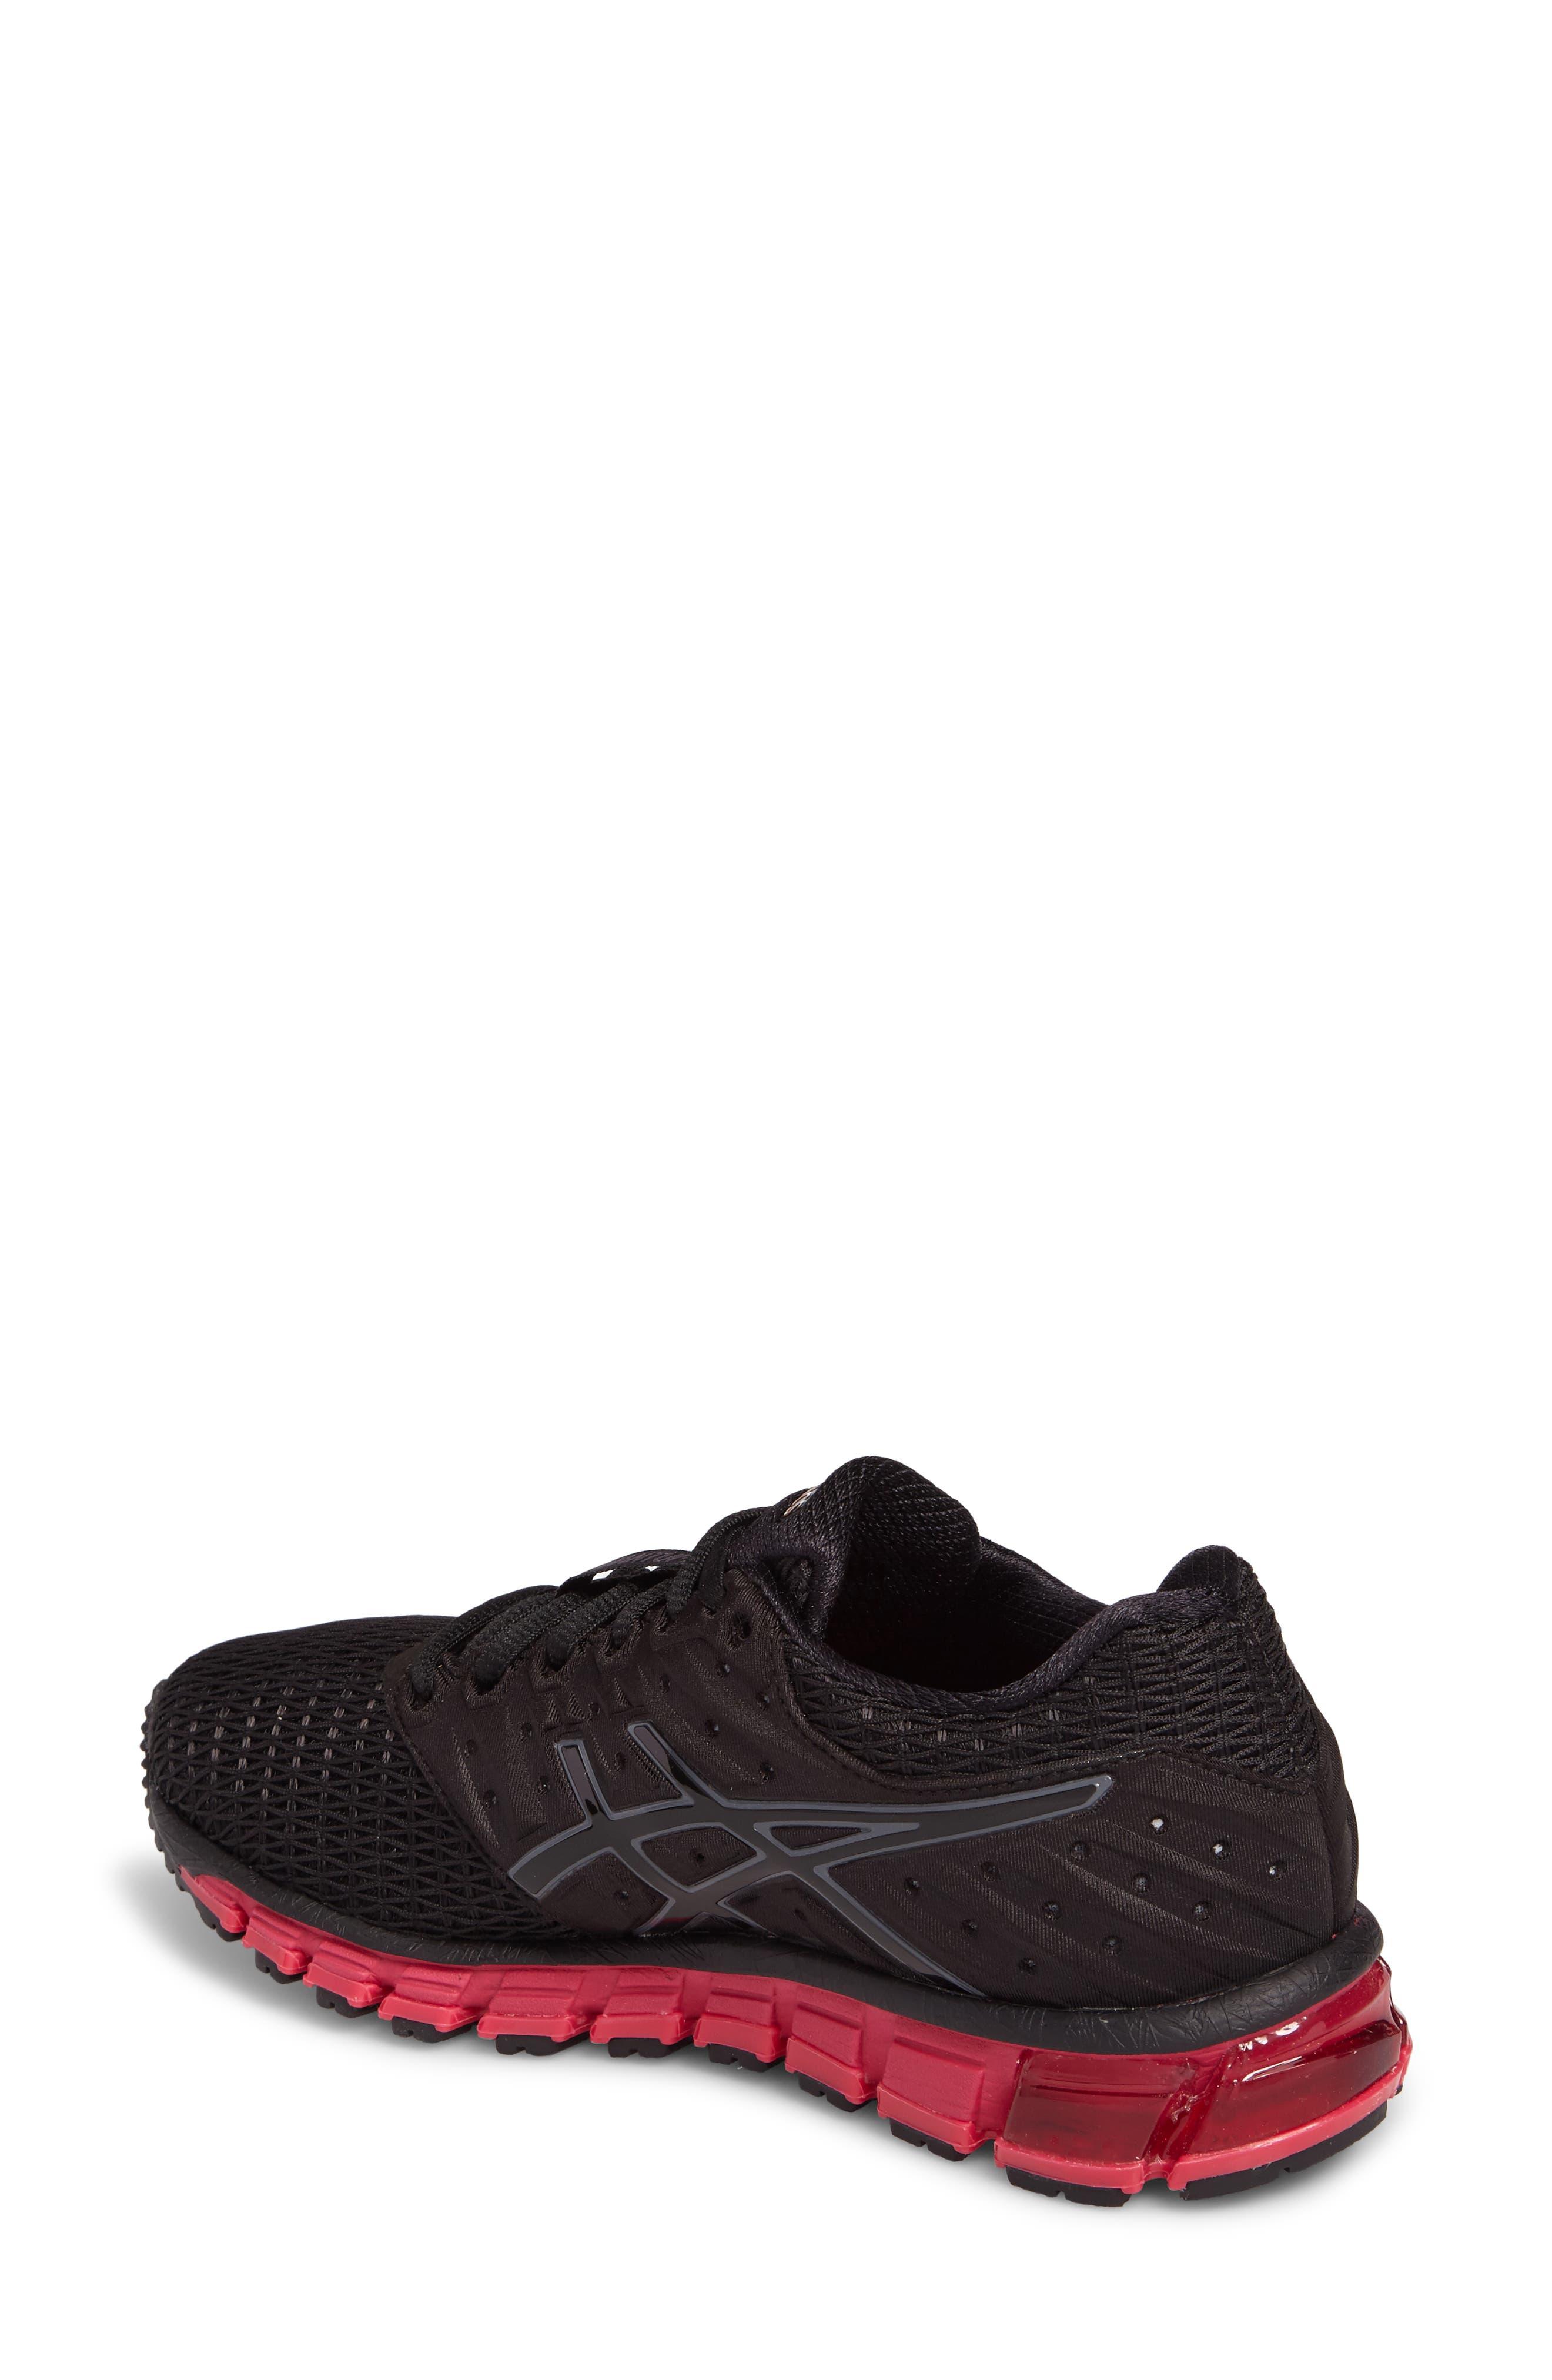 'GEL-Quantum 180 2' Running Shoe,                             Alternate thumbnail 2, color,                             001